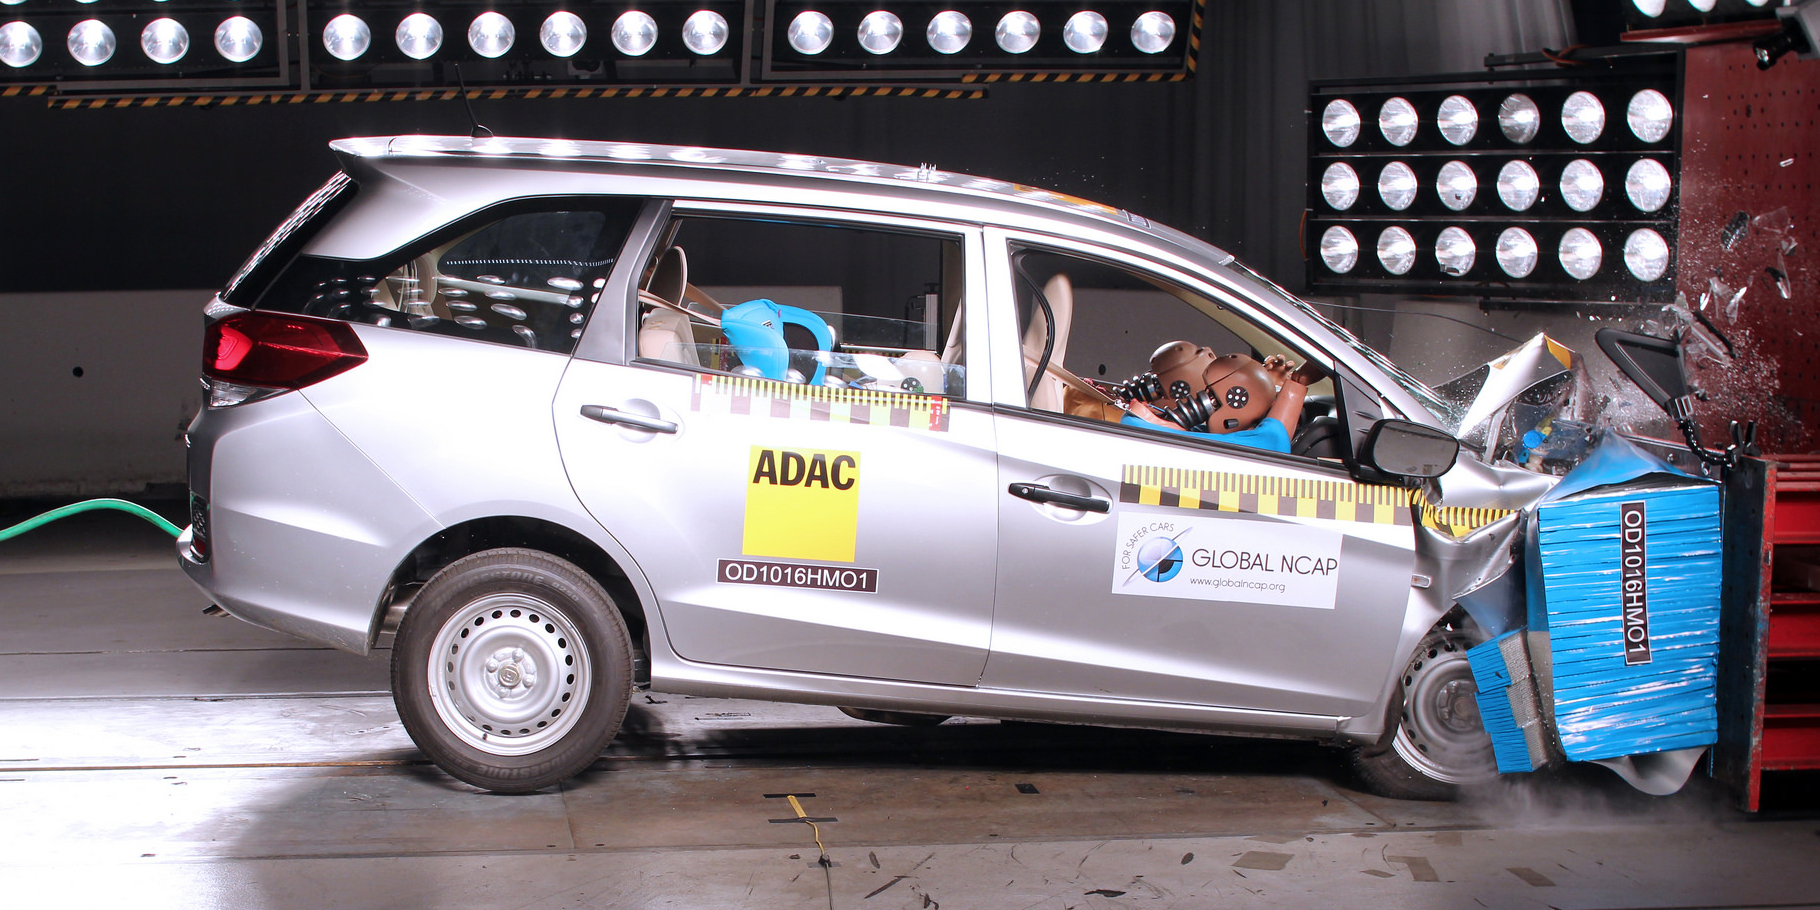 Batacazo para Honda en Global NCap: El Mobilio no logra ni una sola estrella